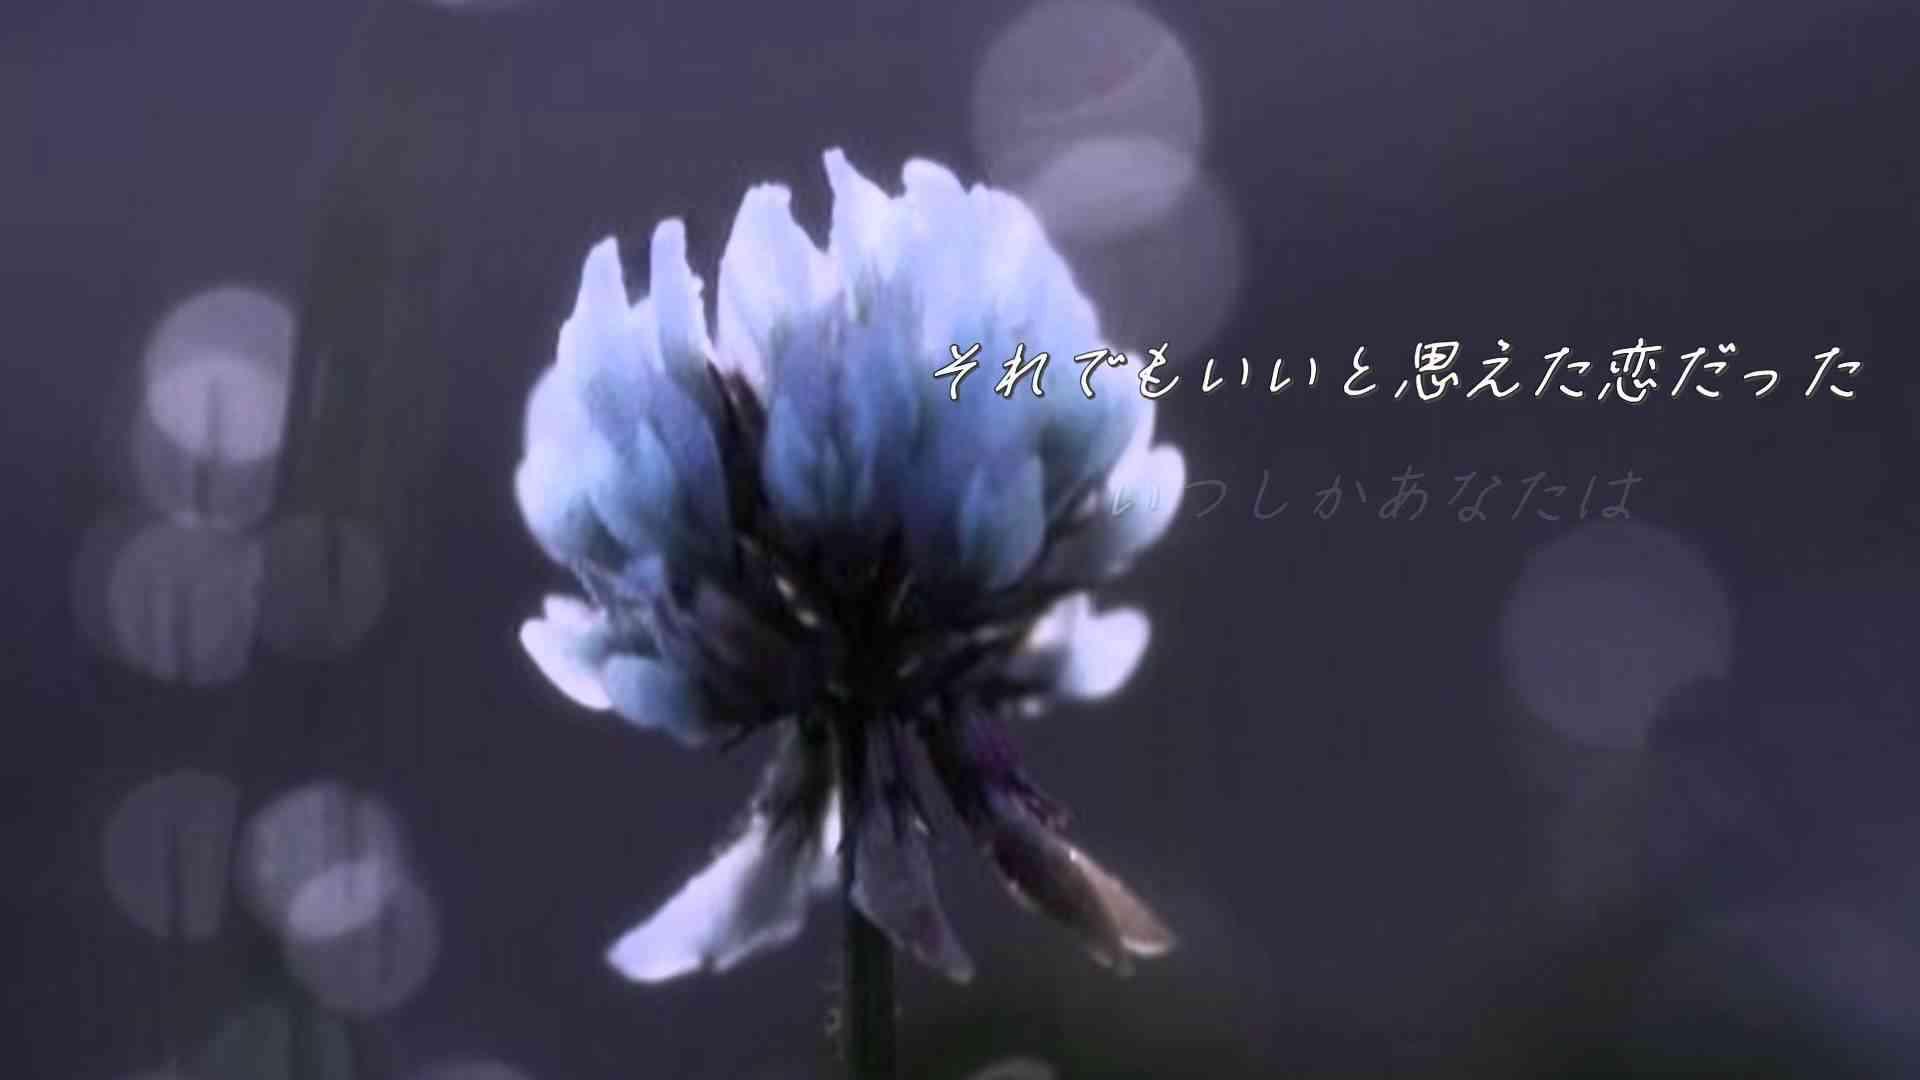 HY 366日 .。.:*・゜歌詞付き:*・゜。:.* - YouTube